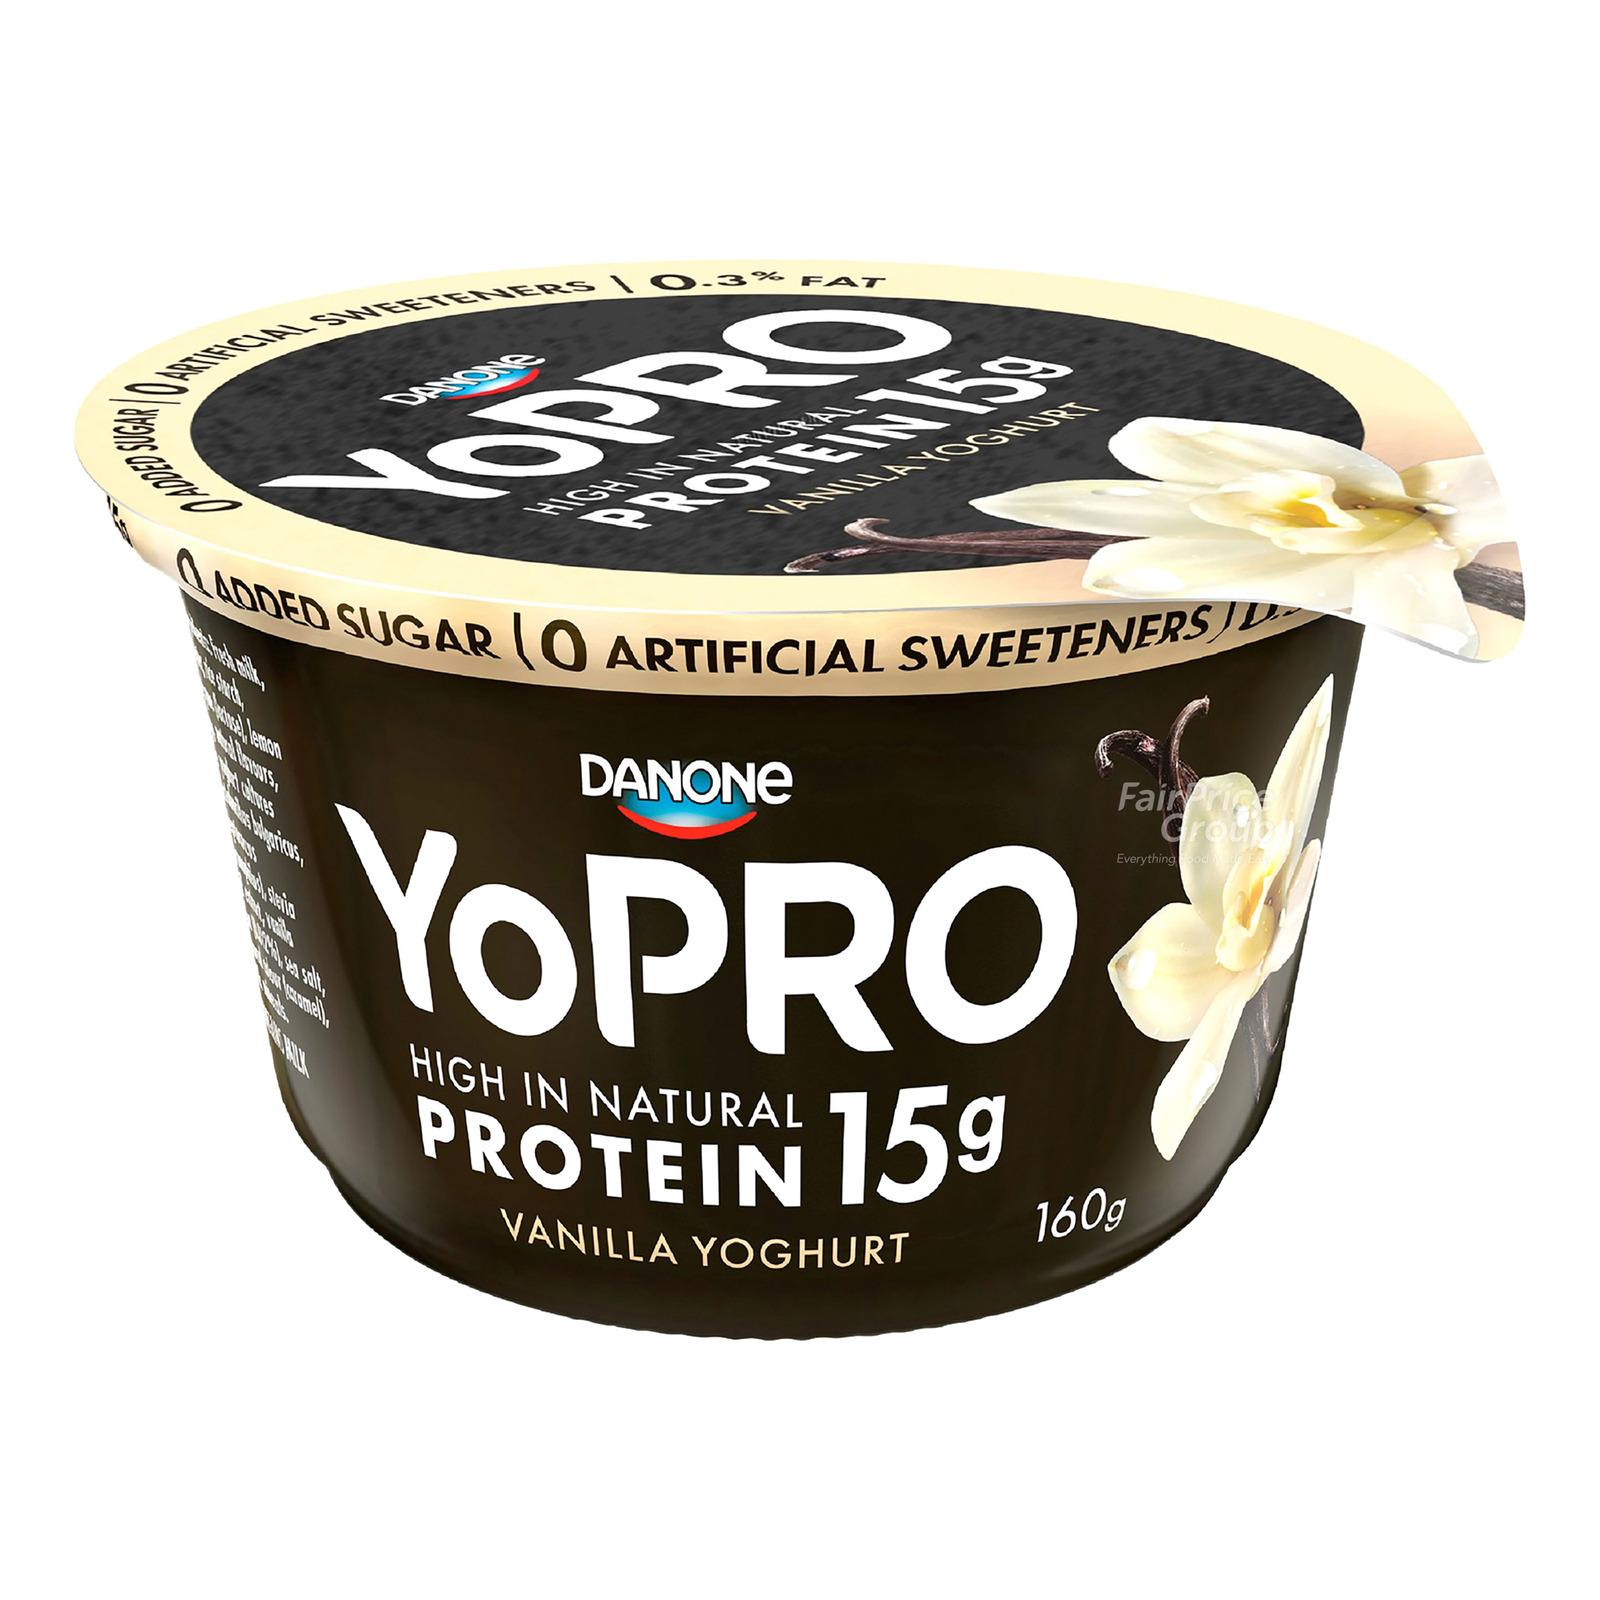 Danone YoPro Yoghurt - Vanilla